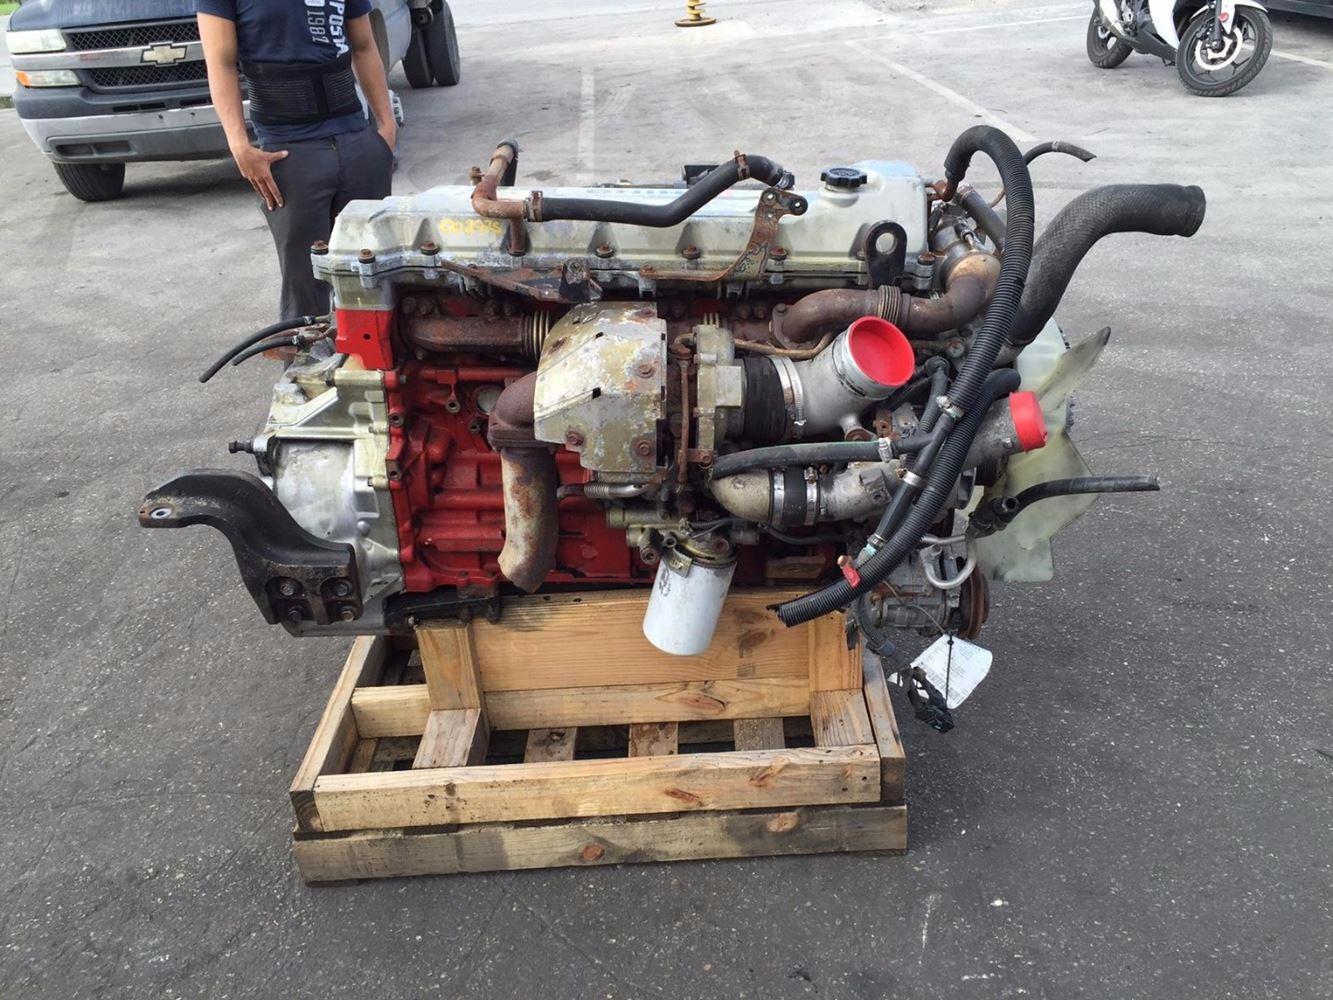 hino jo8e engine camshaft diagram hino jo8e-tb (stock #002975) | engine assys | tpi racing engine camshaft diagram